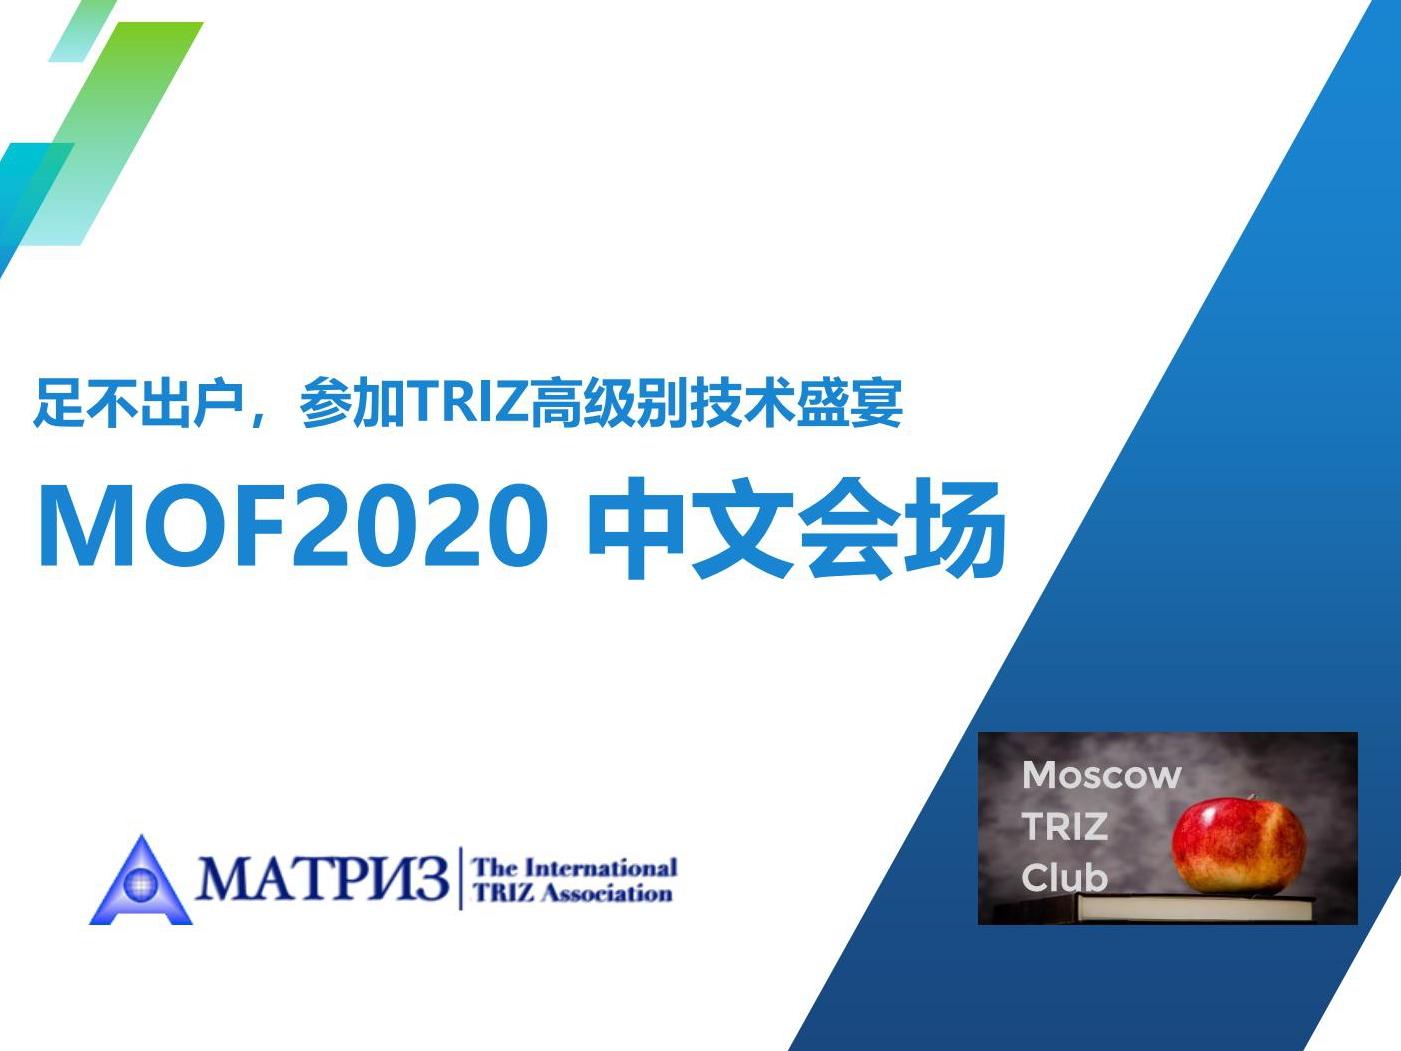 MOF2020 主题与价值:TRIZ界第一次线上盛宴